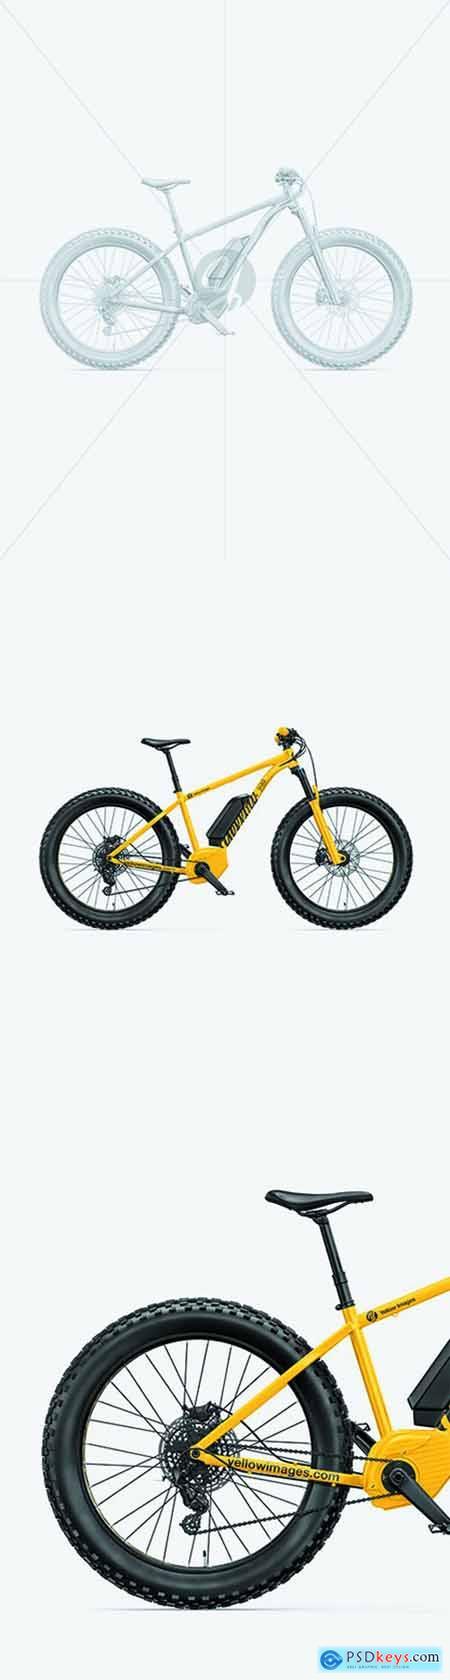 Fat Bike Mockup - Right Side View 68684